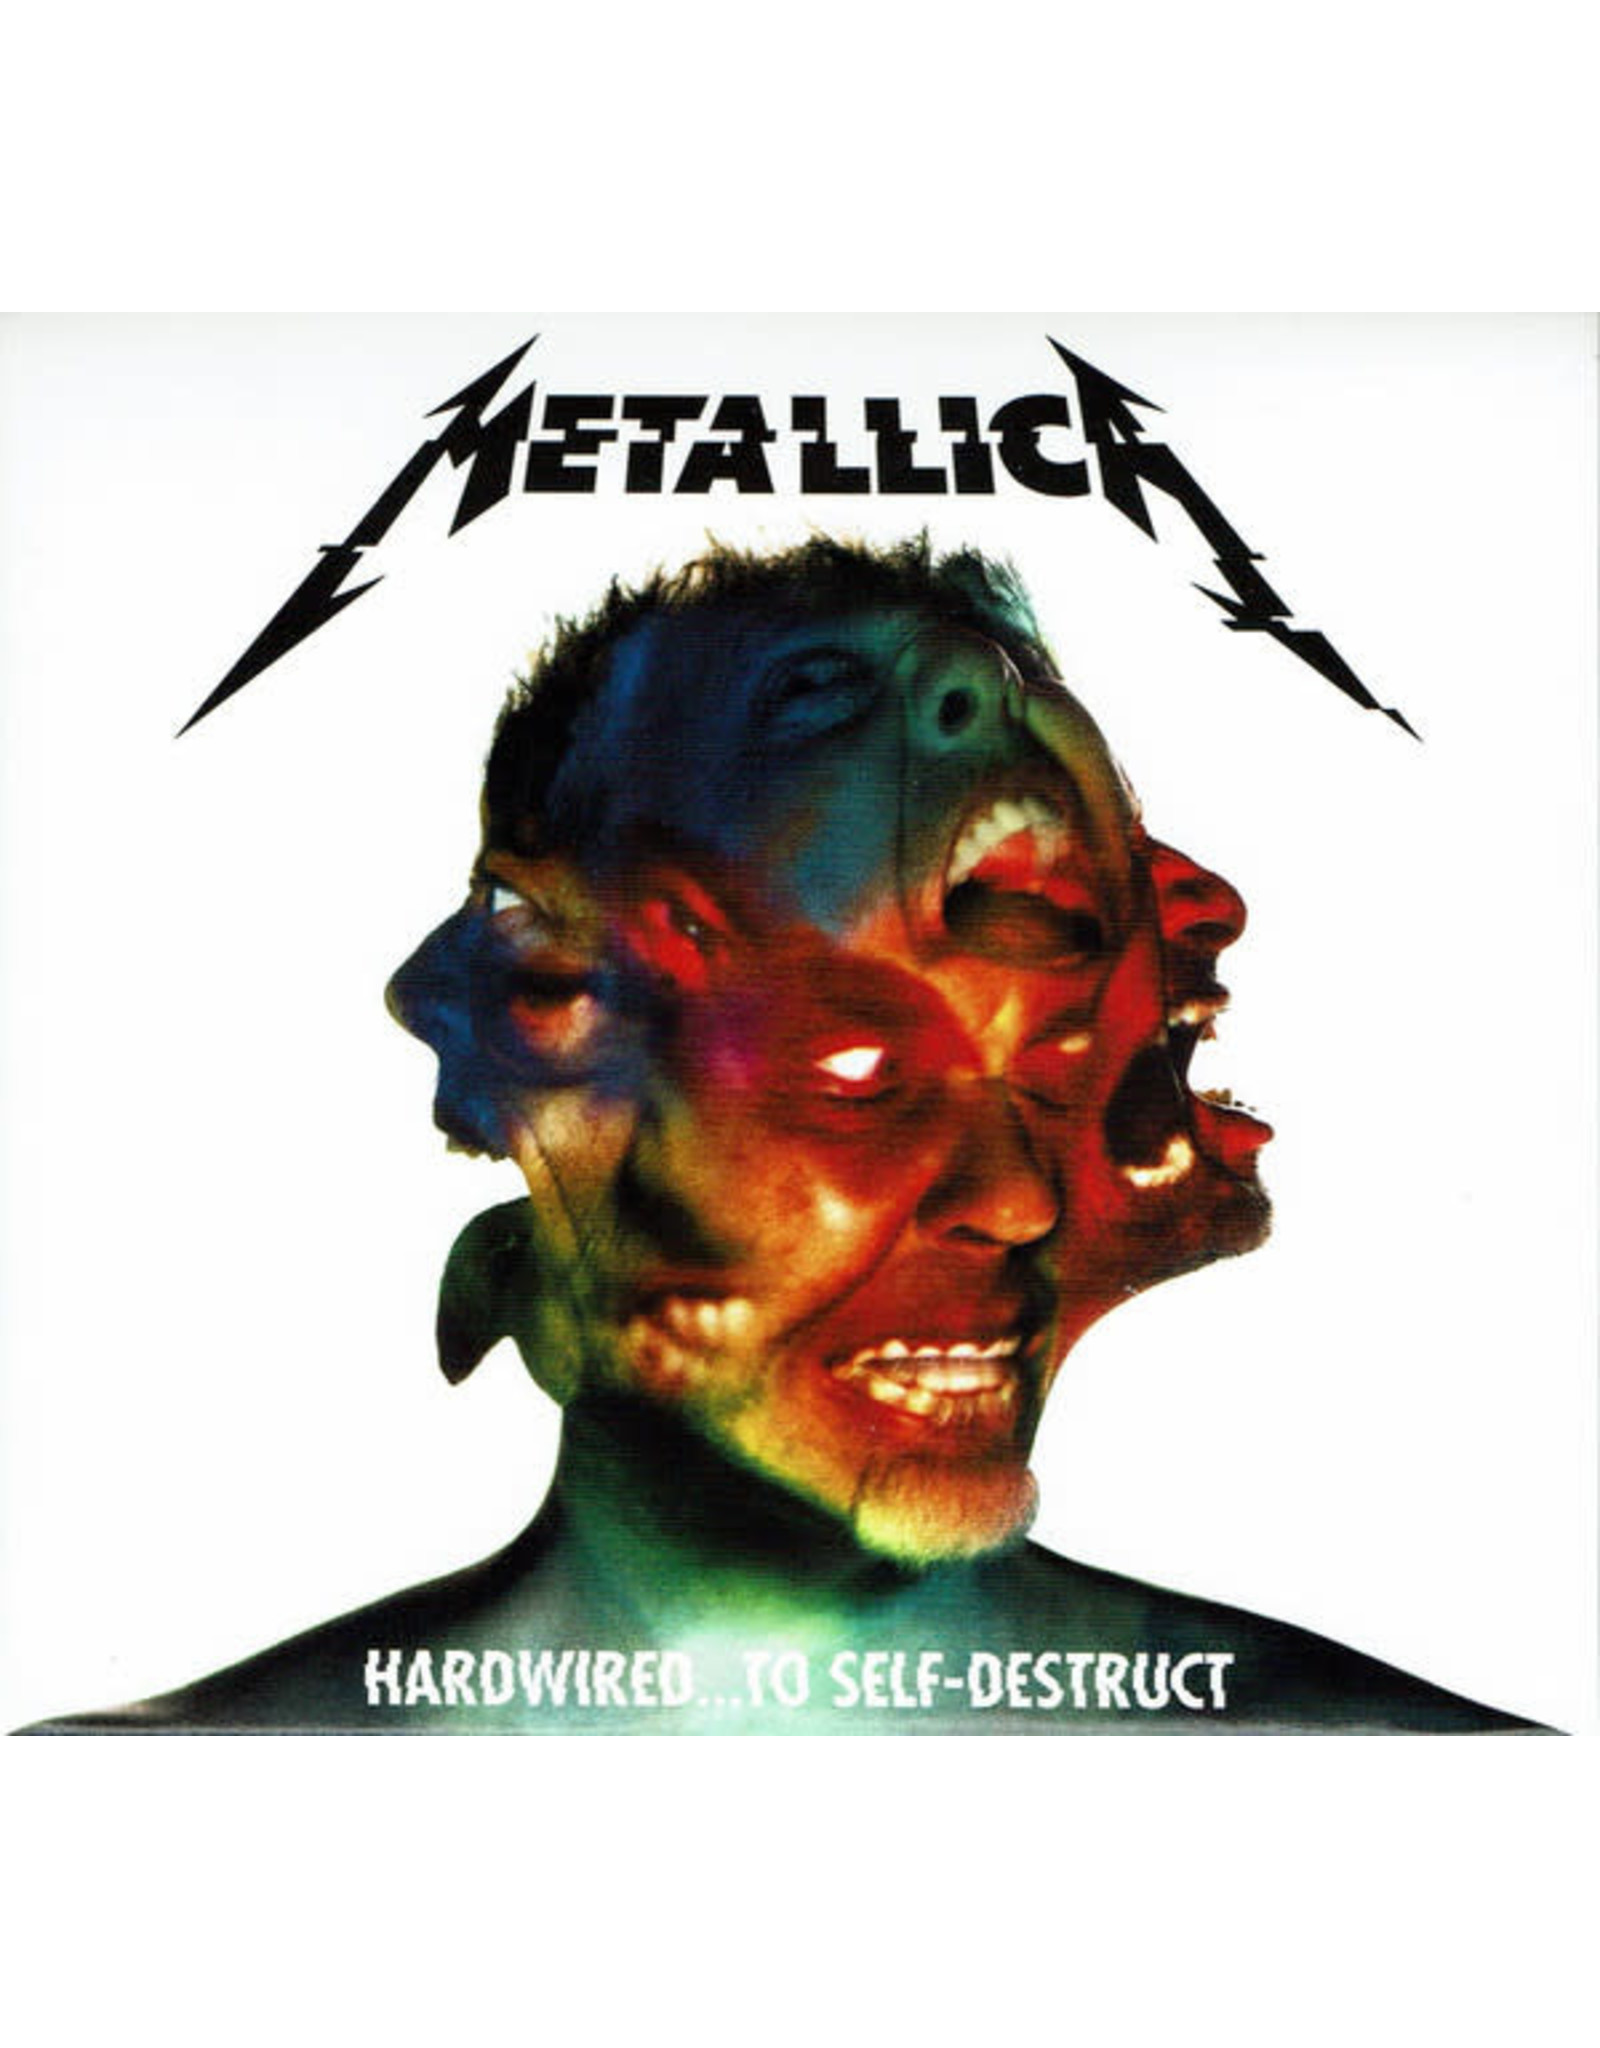 Metallica - Hardwired... To Self-Destruct CD